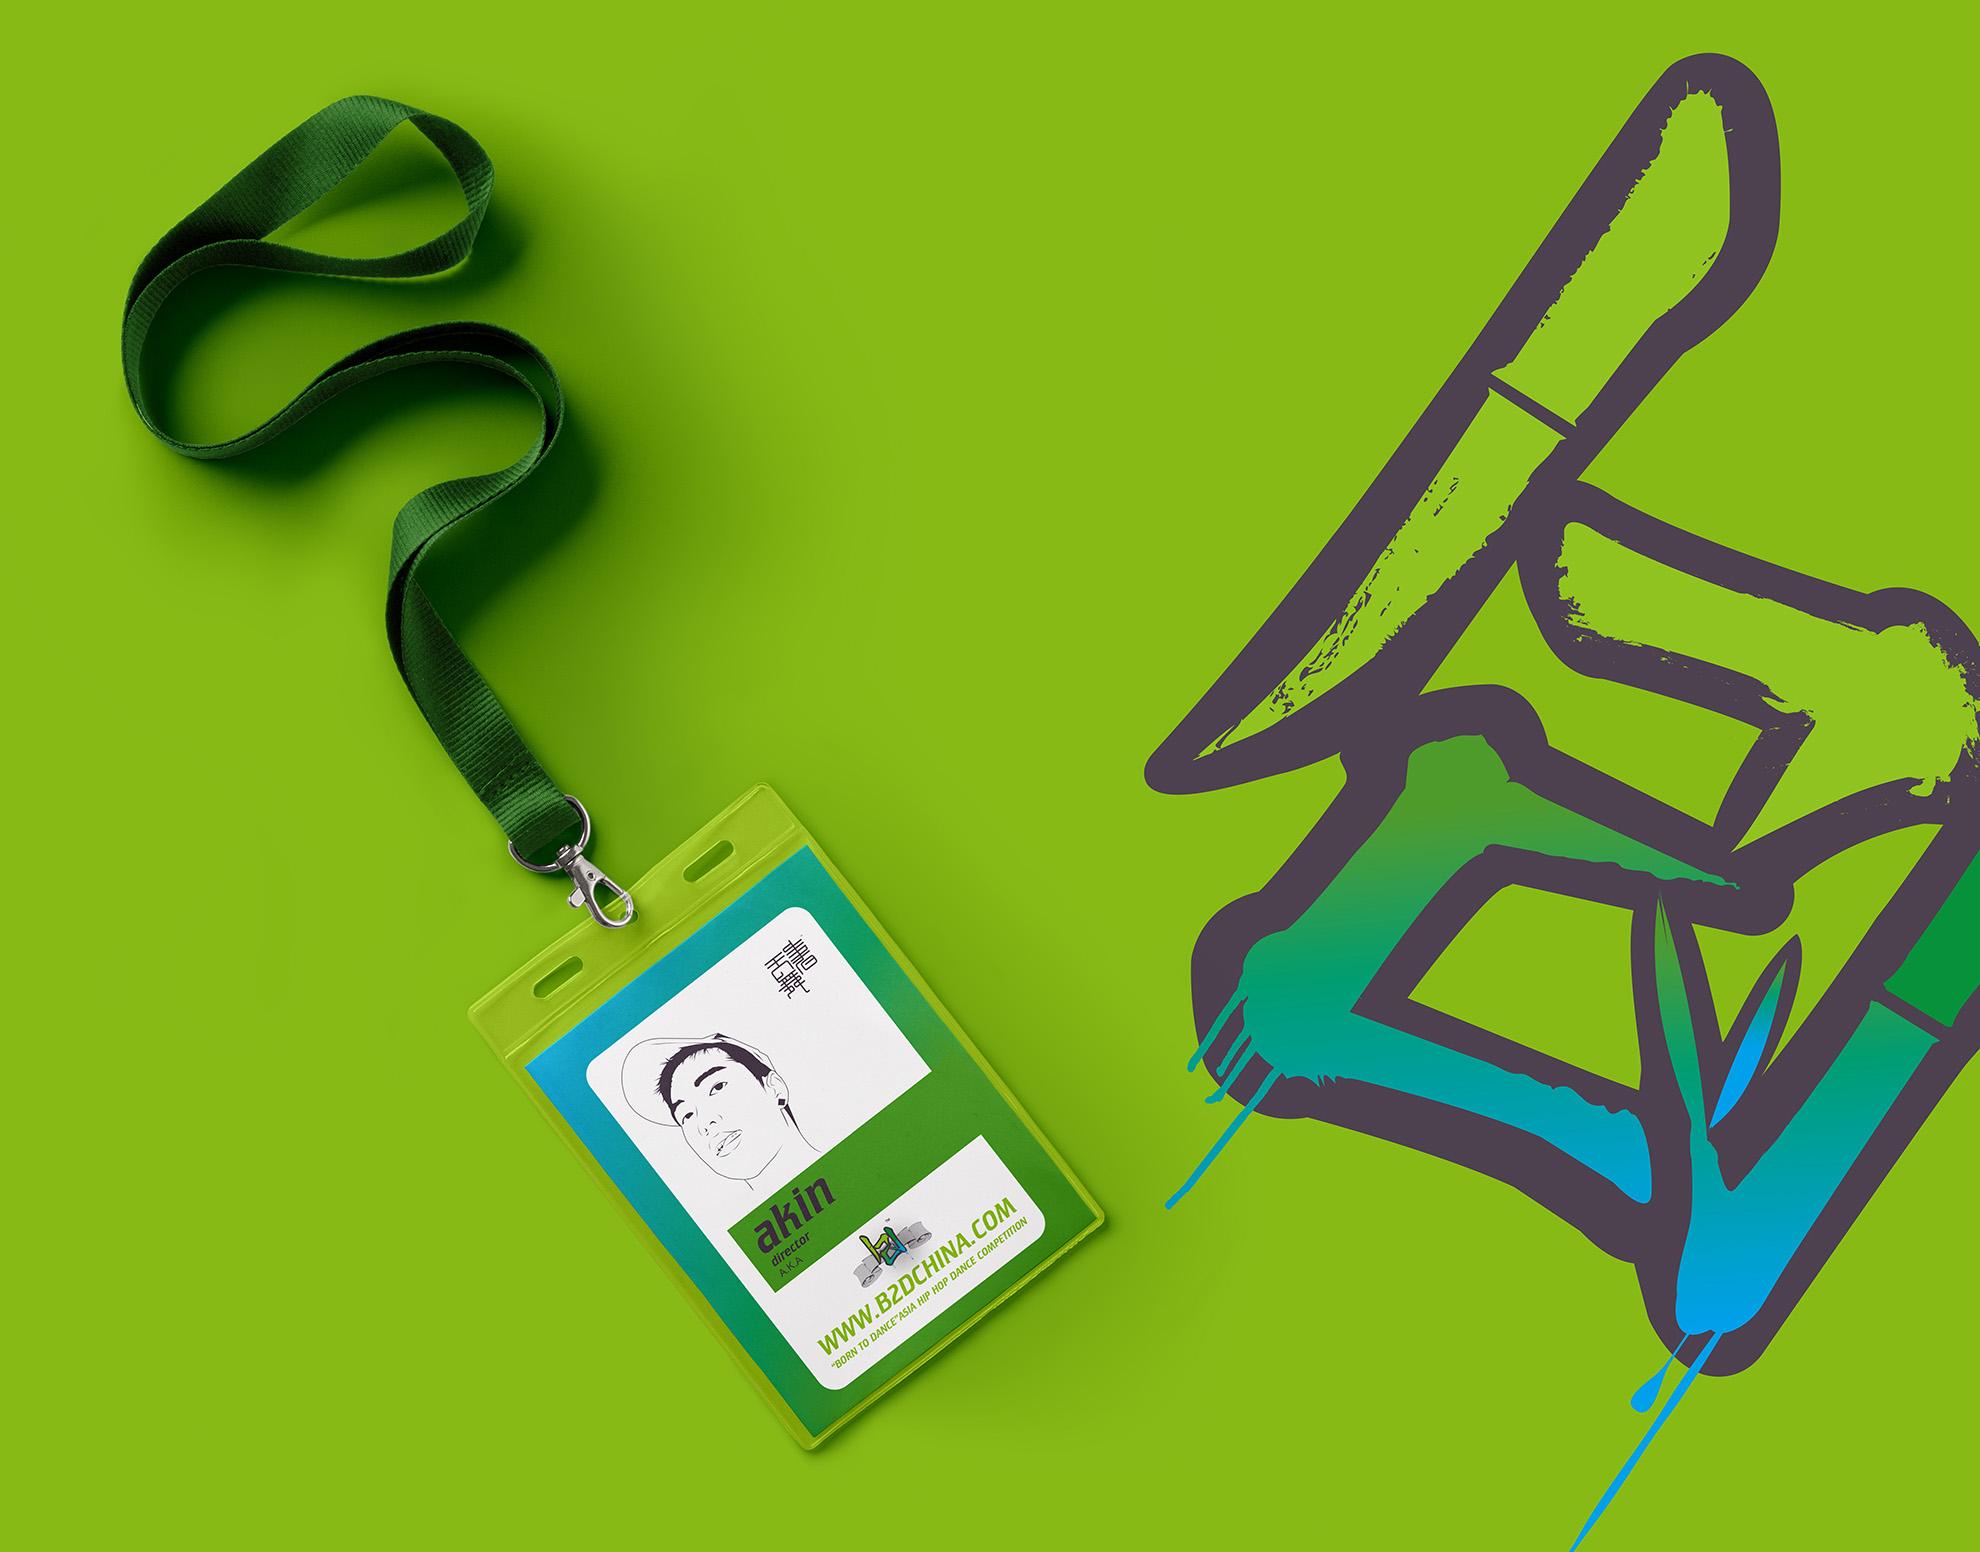 ID-Card-Holder-Mockup-vol-3